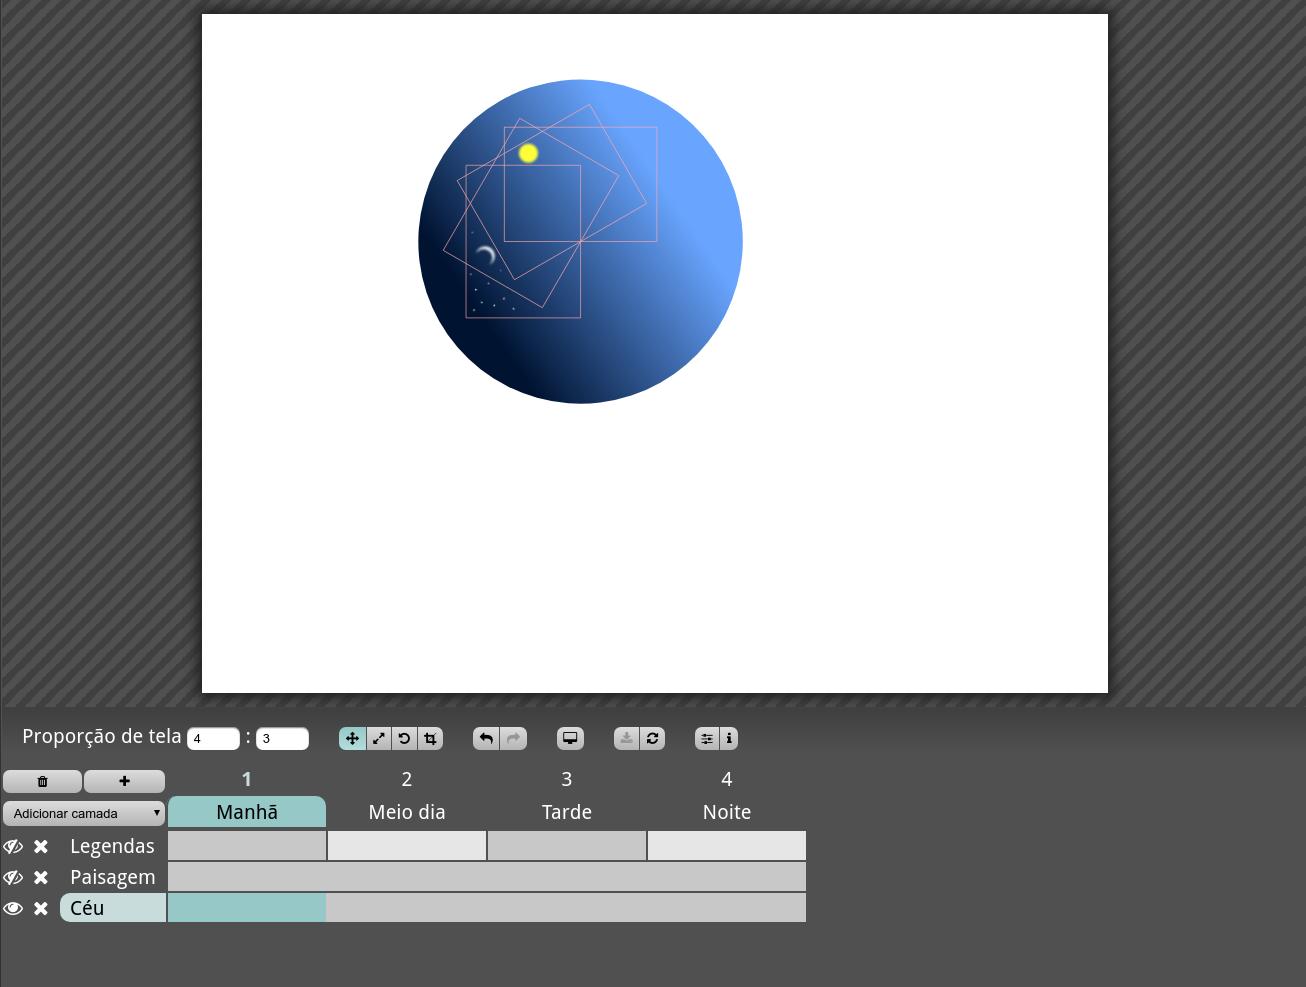 Select layer Legendas for frame 1